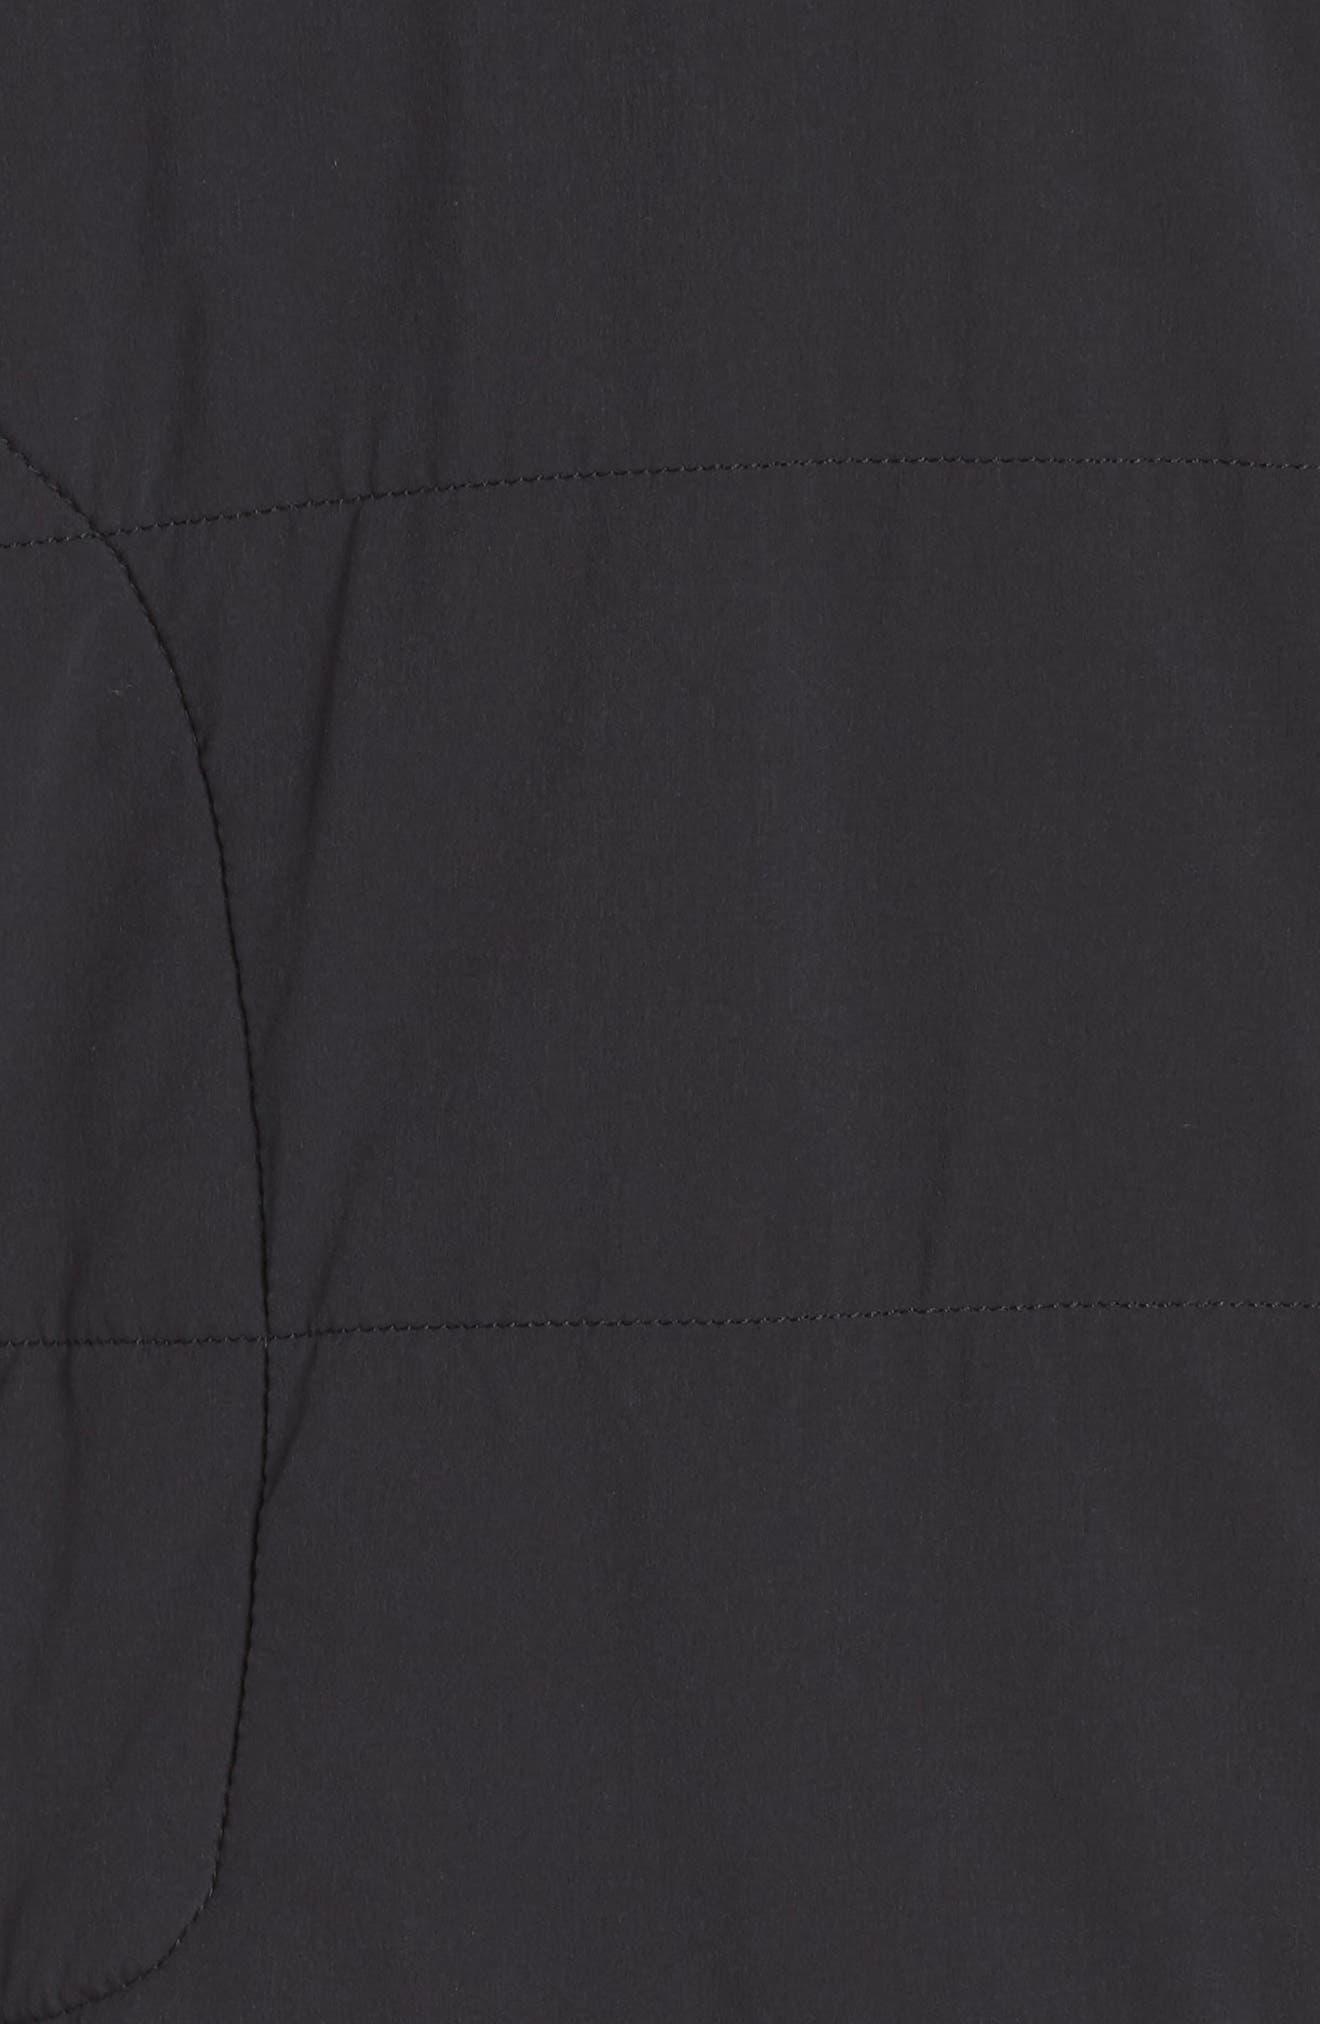 Mountain Snap Neck Sweatshirt,                             Alternate thumbnail 6, color,                             001